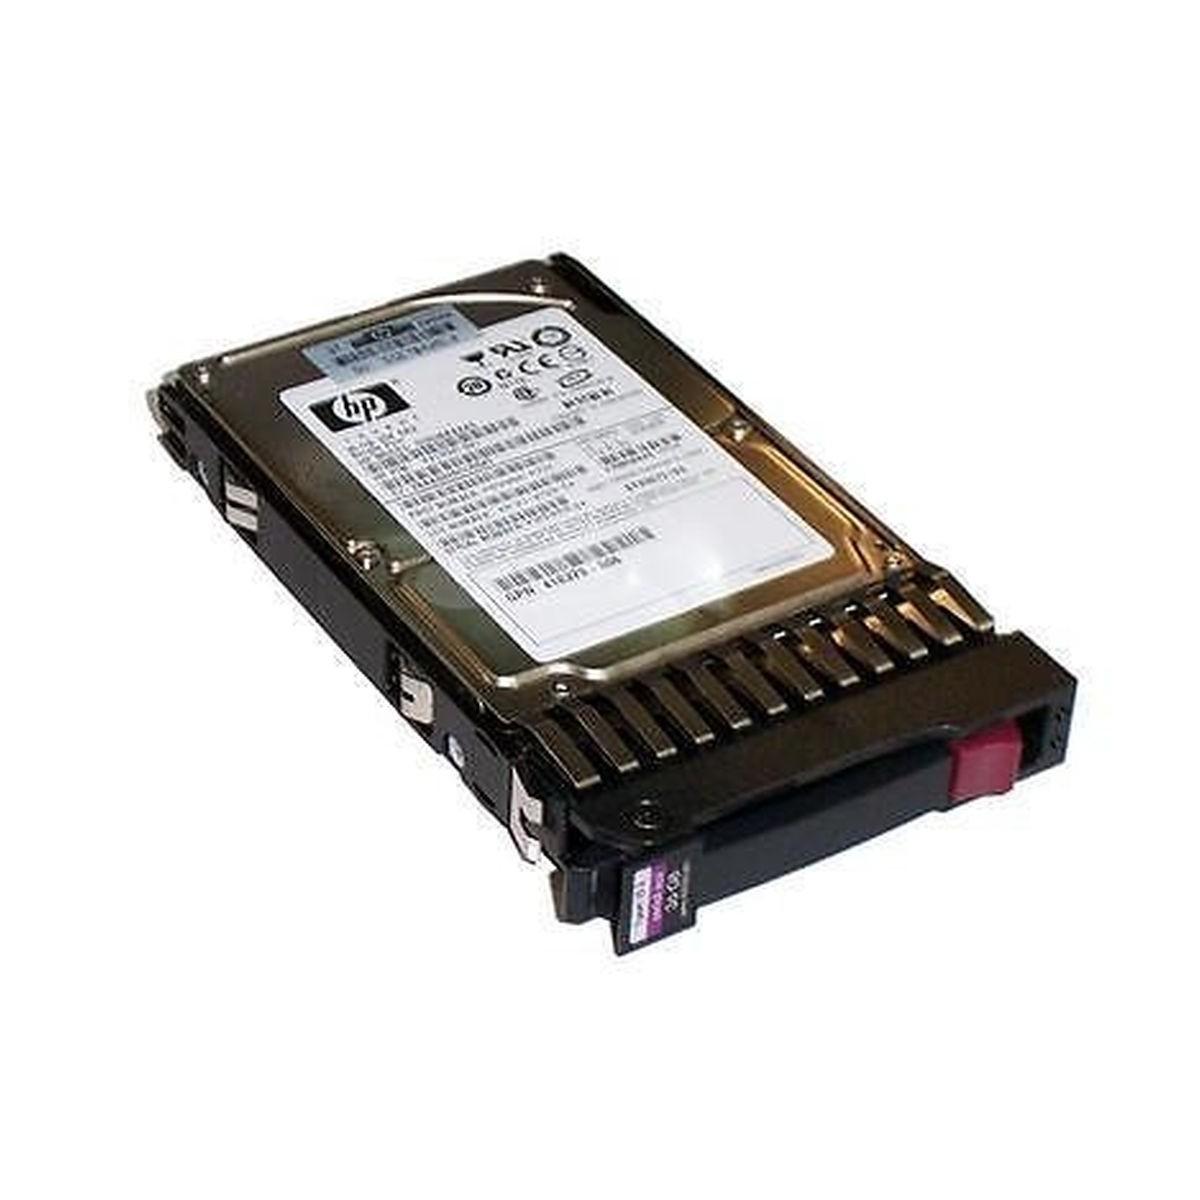 DYSK TWARDY 2,5'' HP 36GB SAS 15K 3G 418373-006